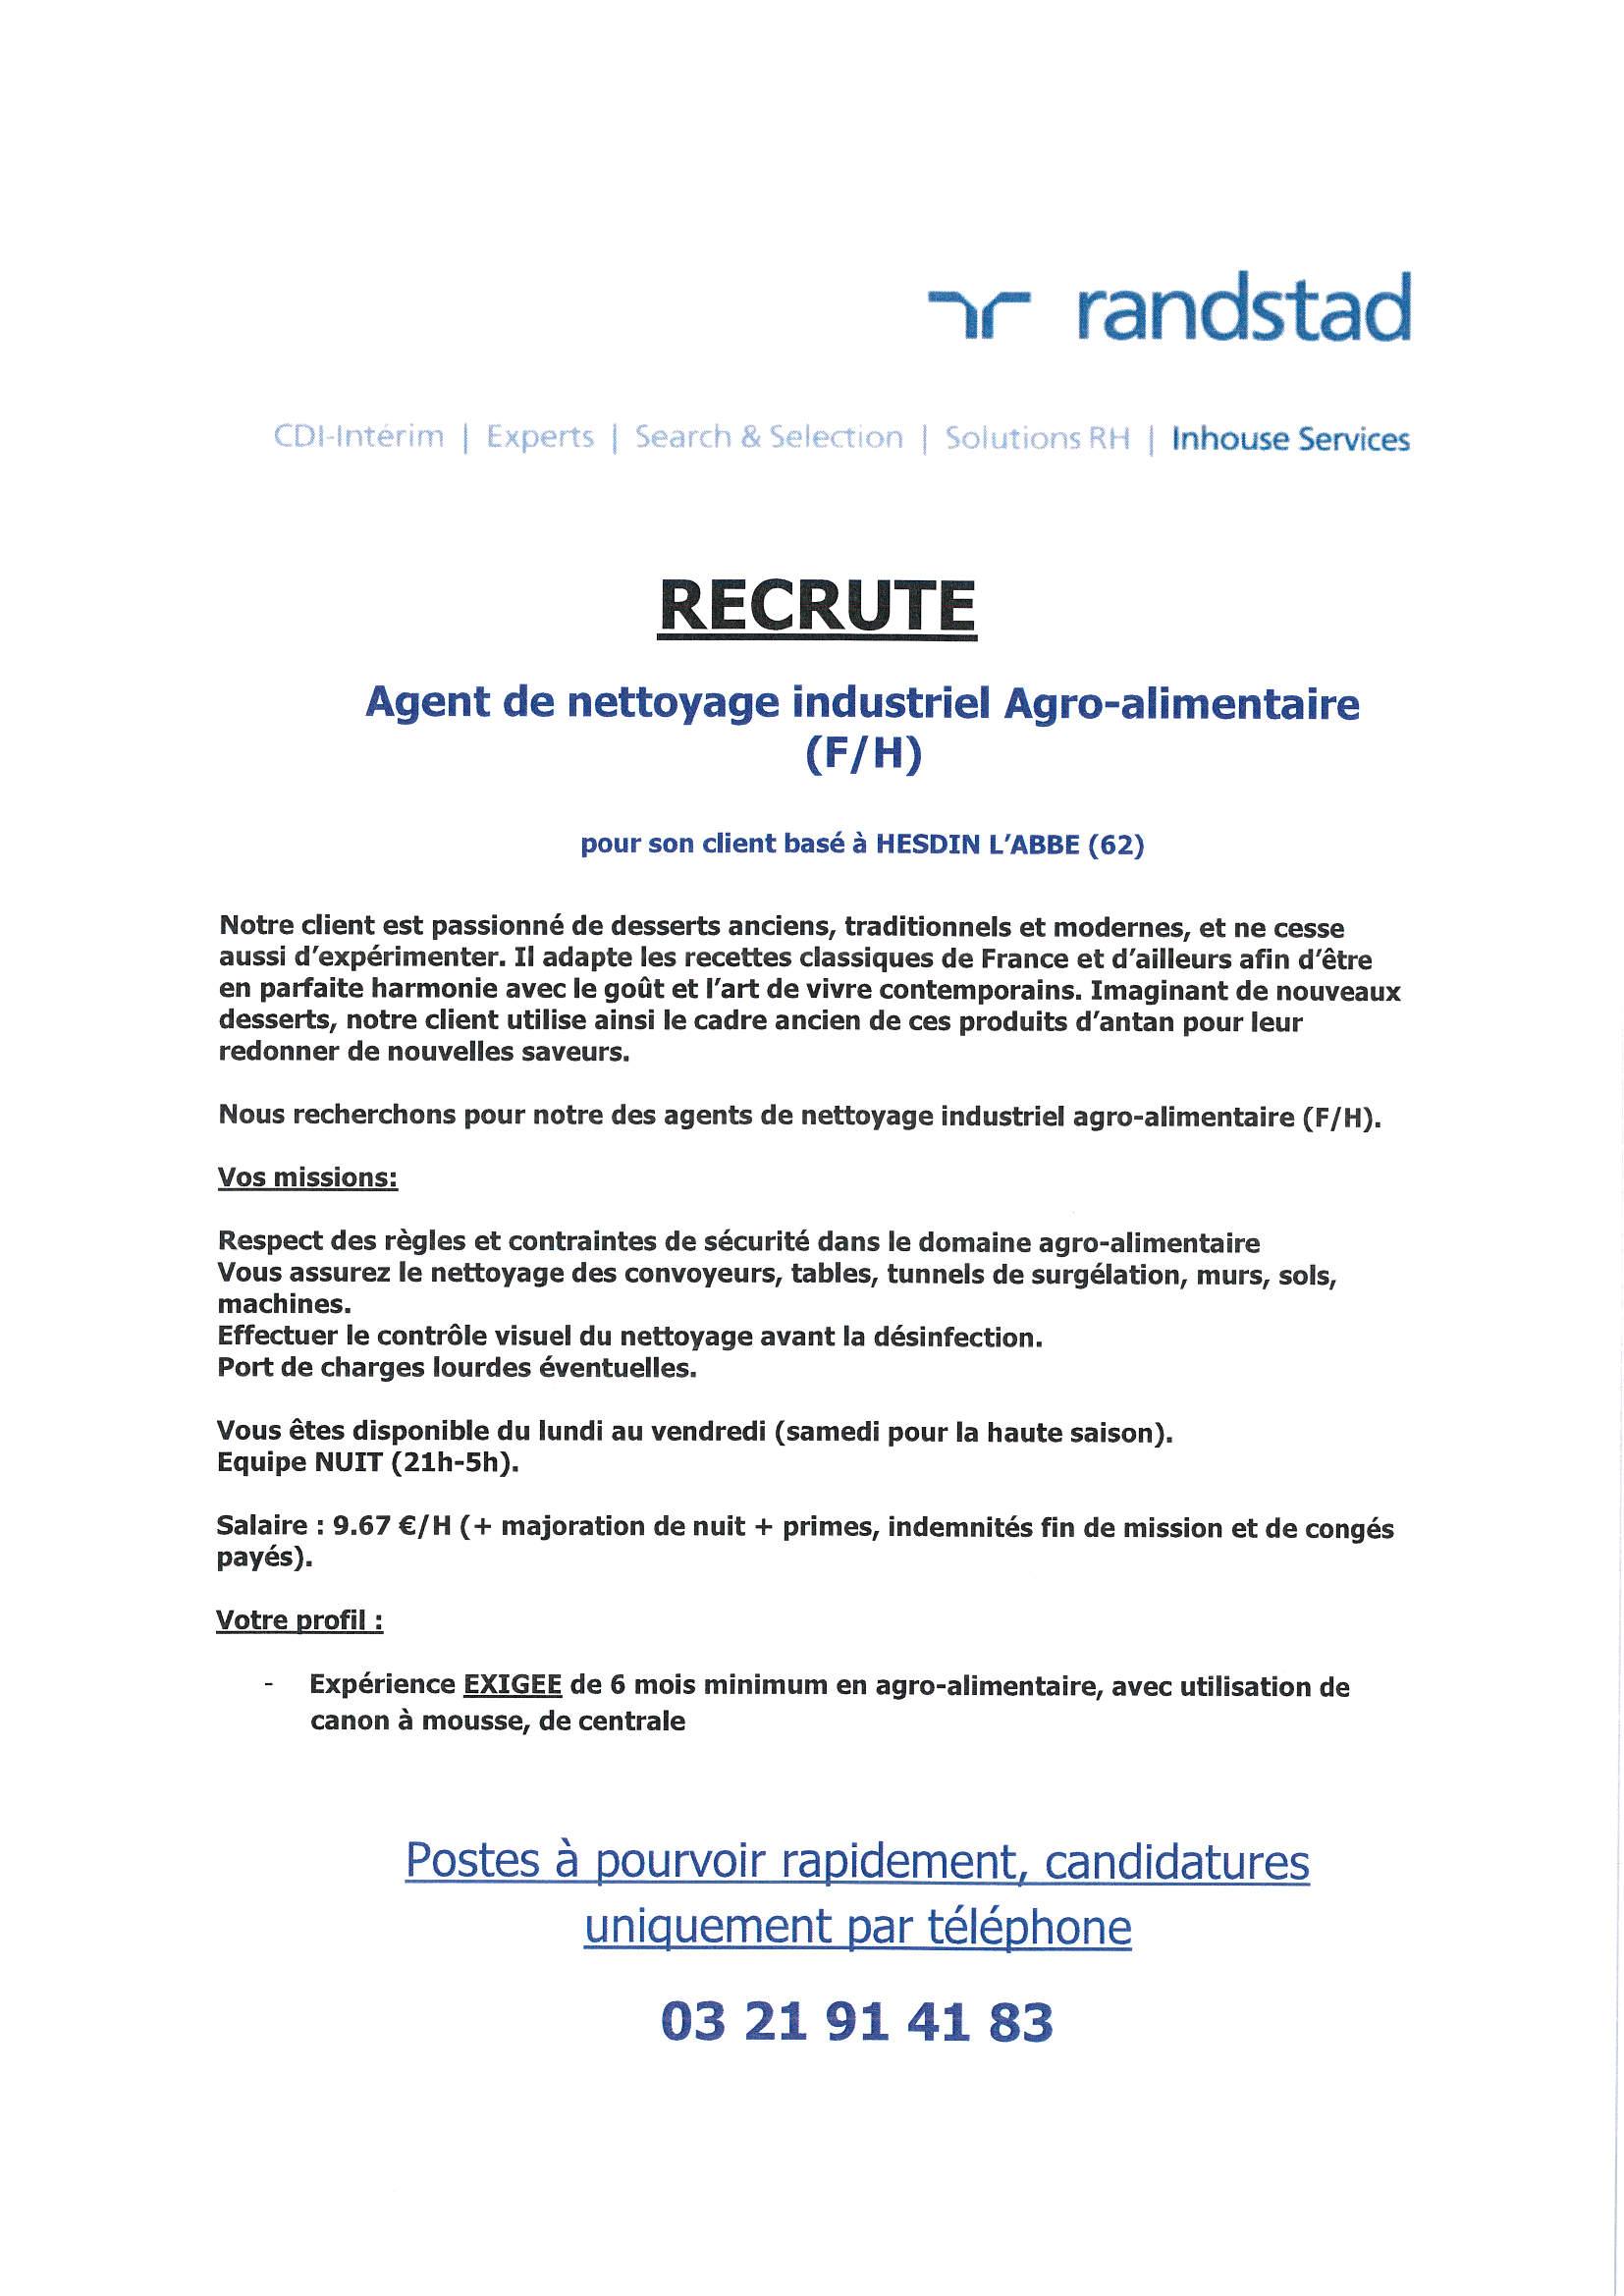 recrute_002.jpg